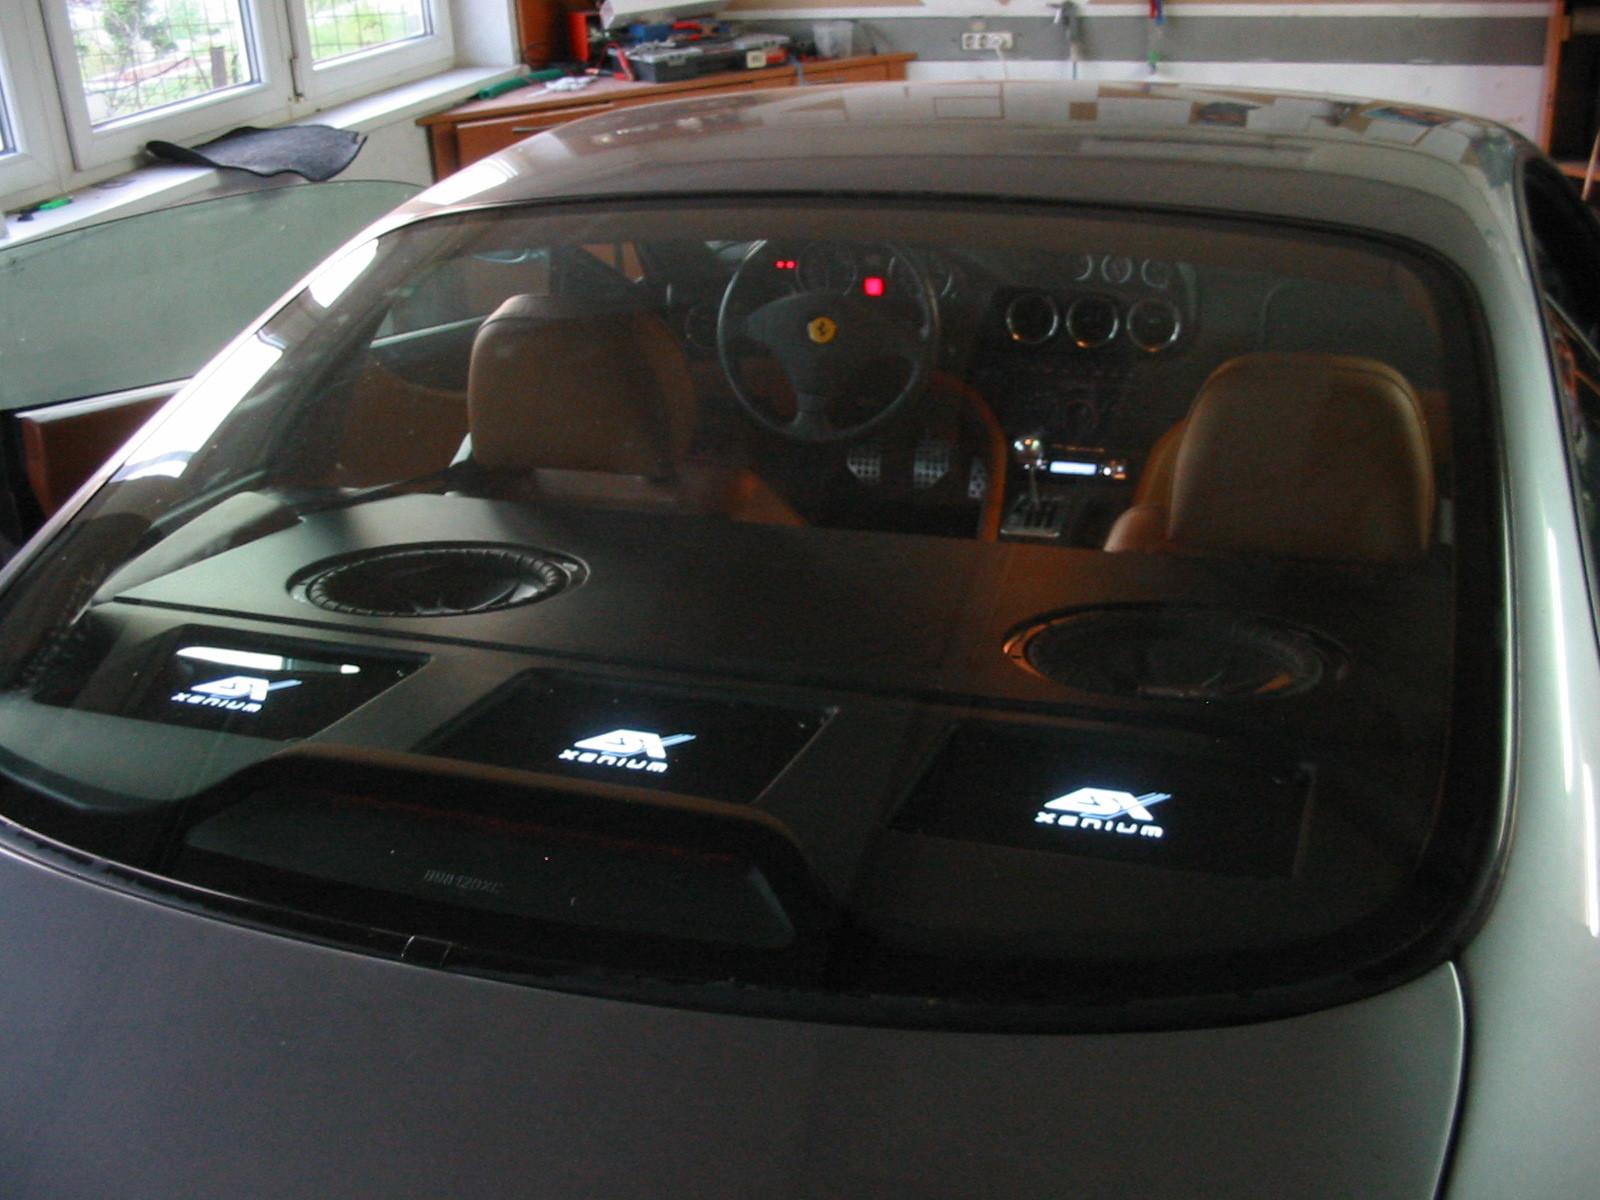 Ferrari 550 Maranello - Verstärker